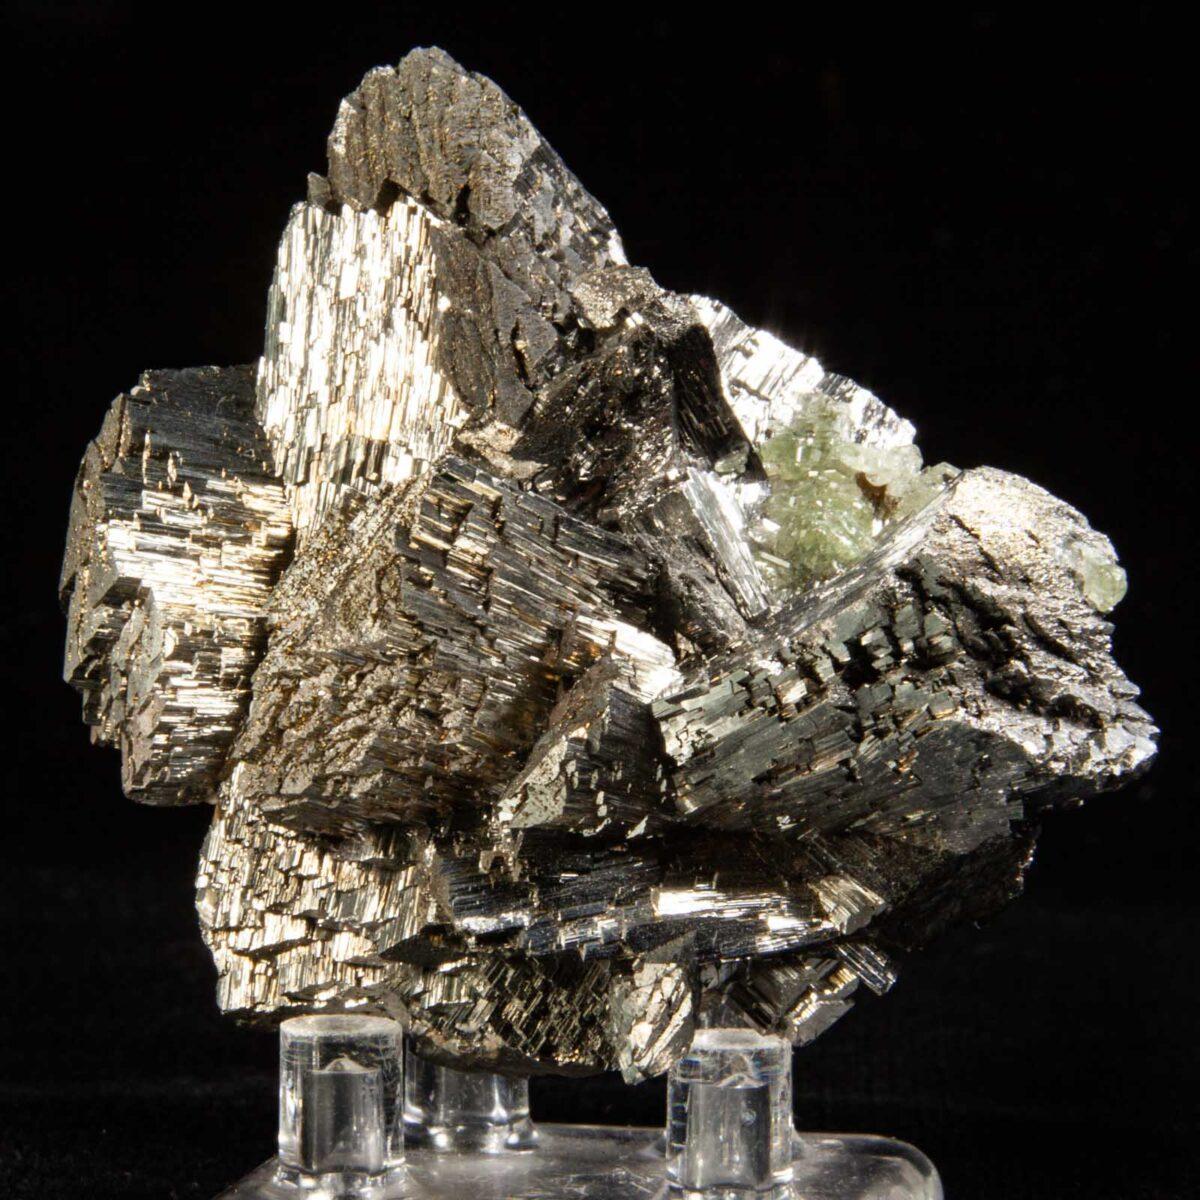 Arsenopyrite and Siderite with Apatite